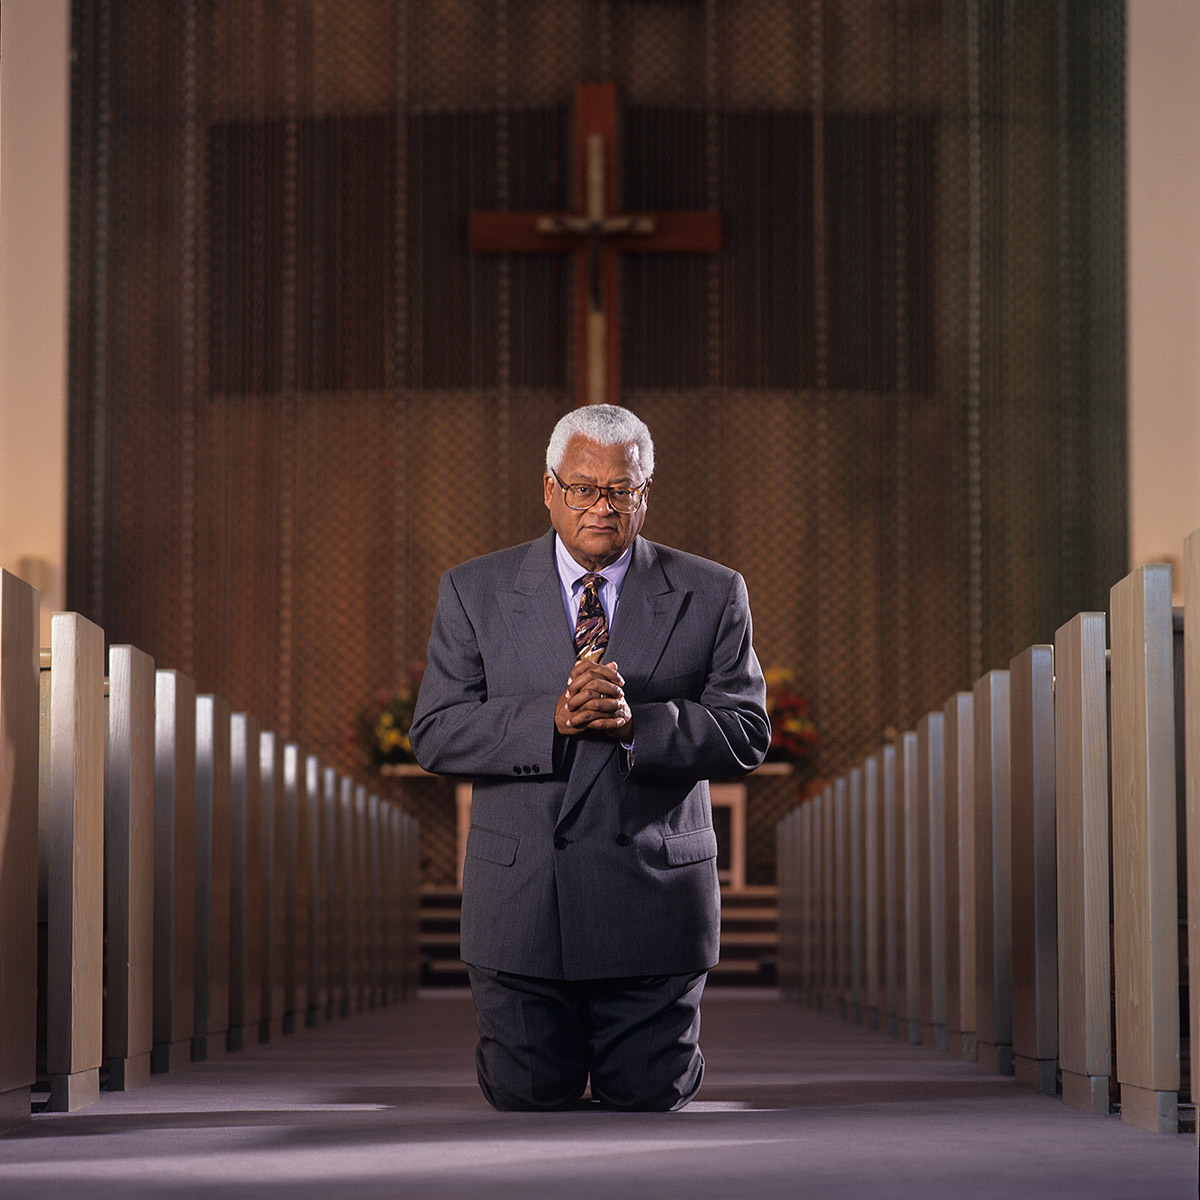 Reverend Jim Lawson